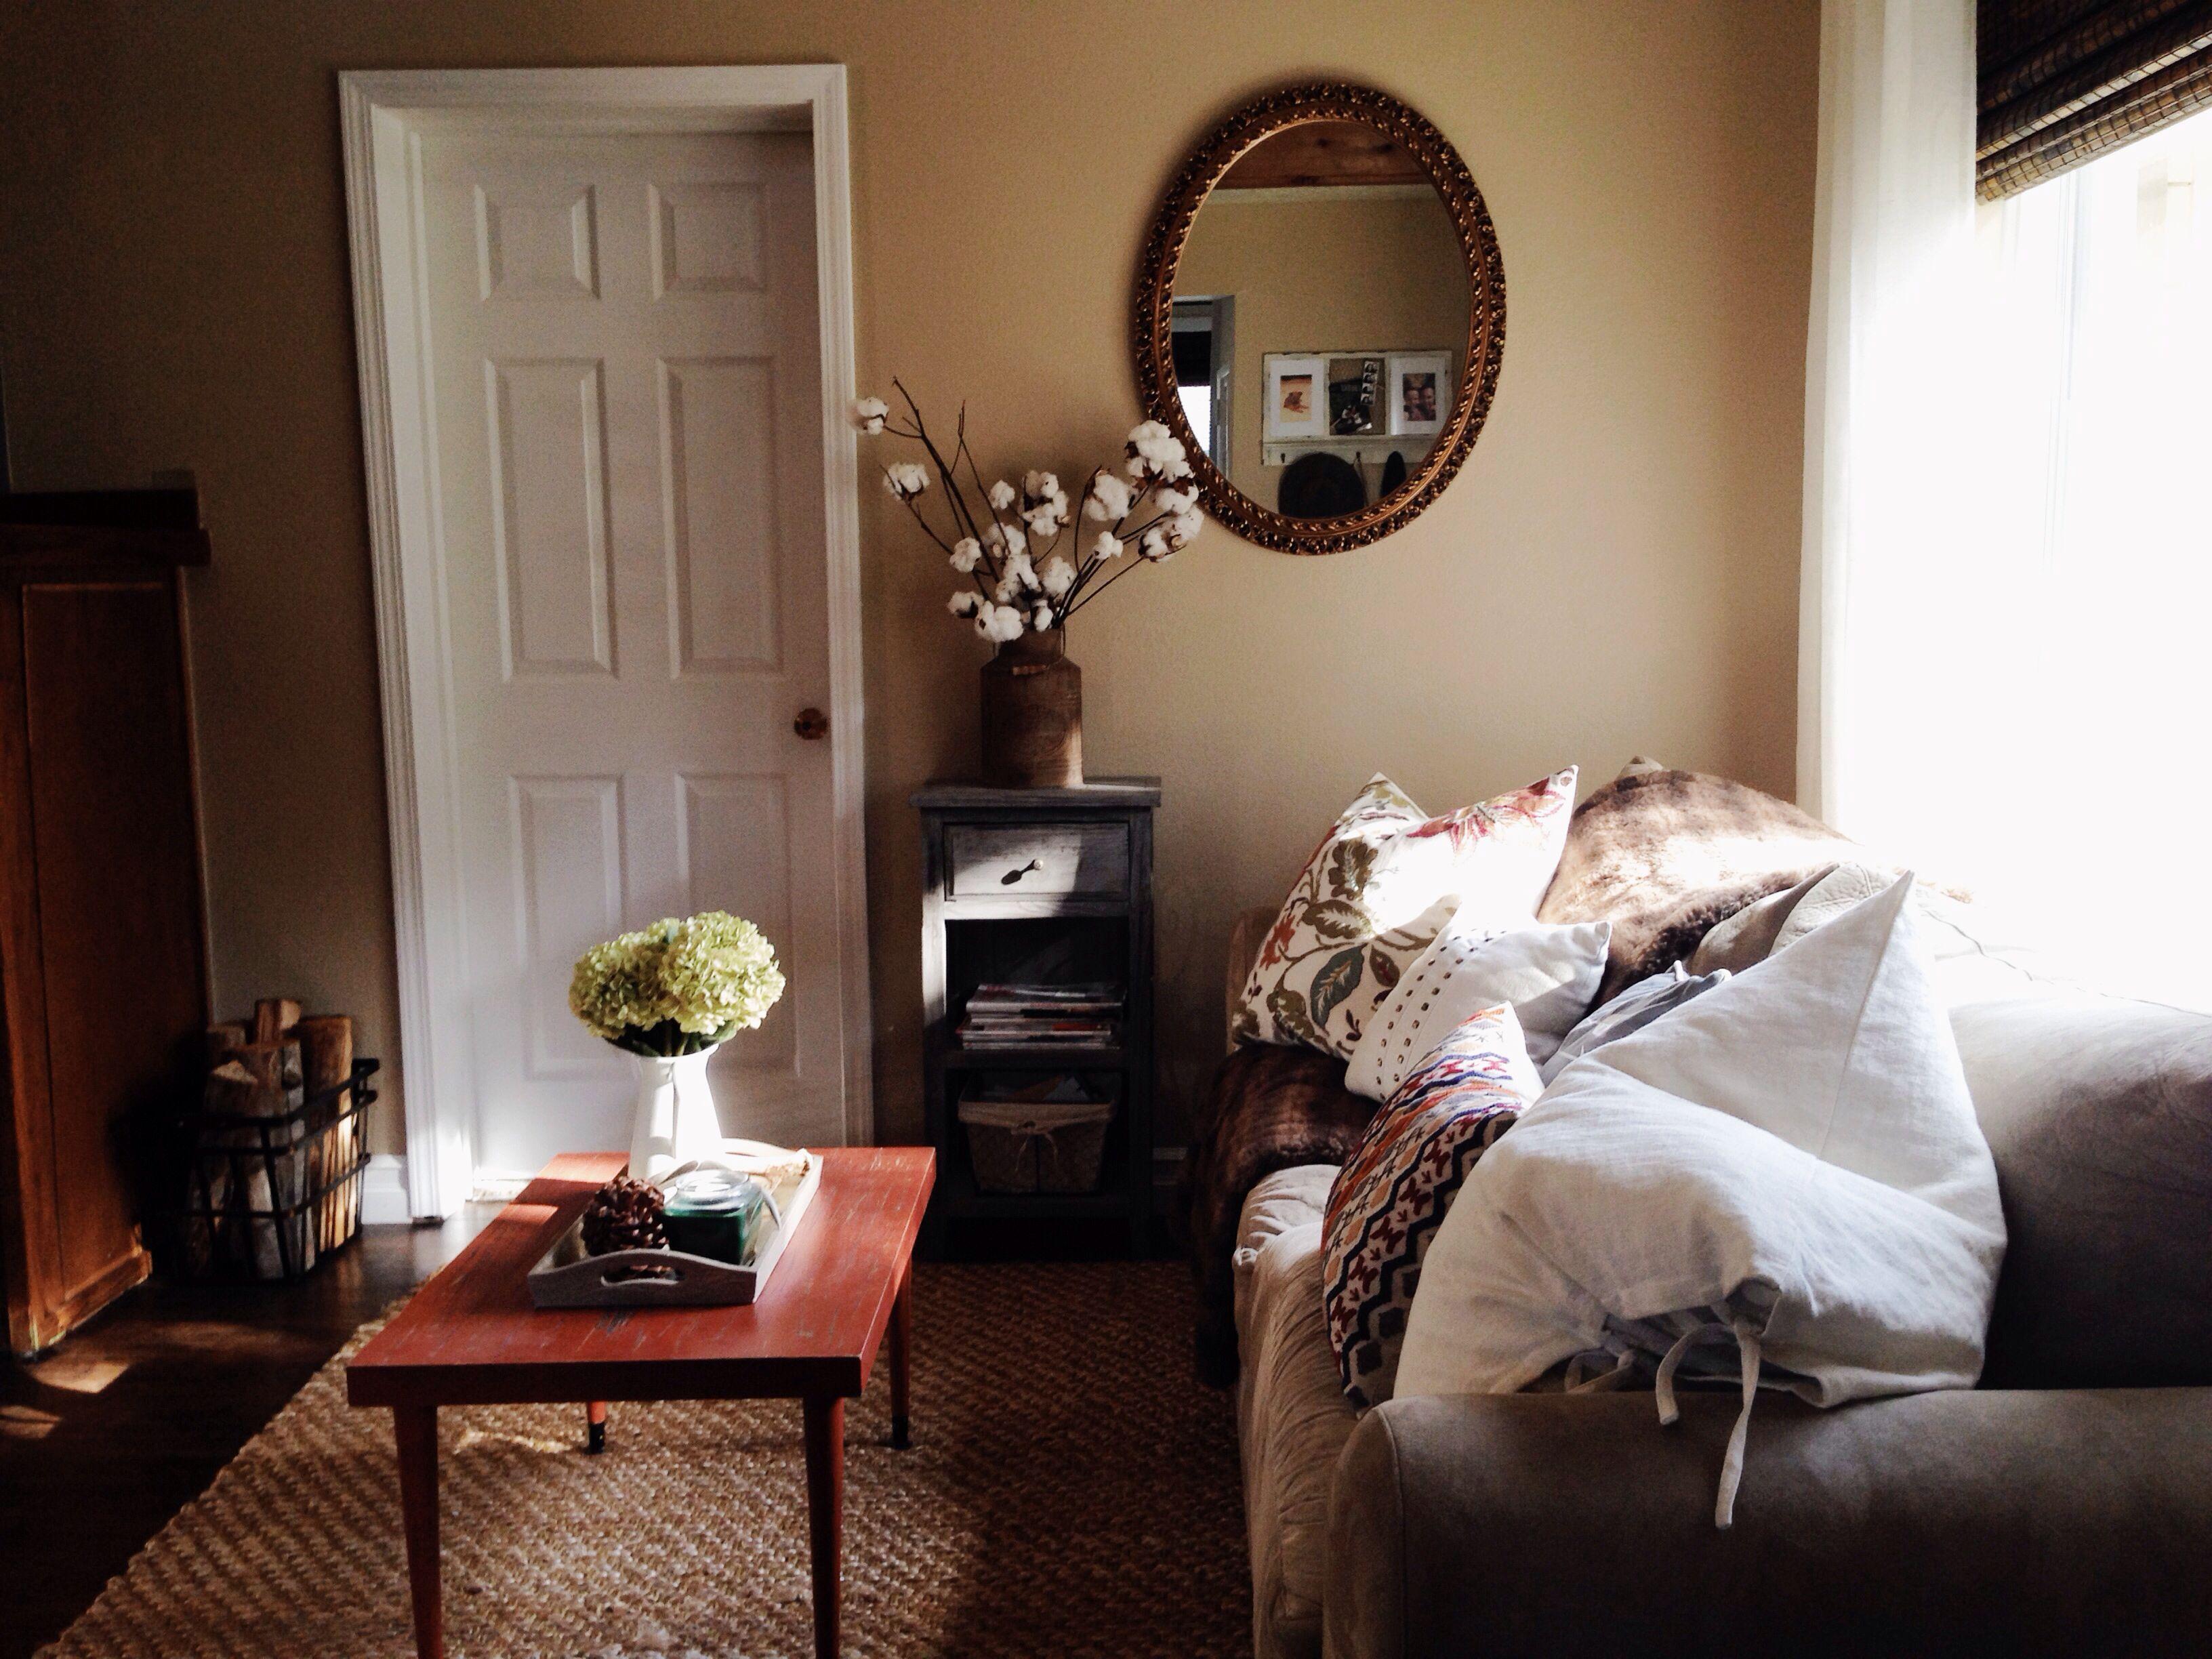 Bon Rustic Home Decor; Boho; Bohemian Home Decor; Farmhouse; Cottage; Country;